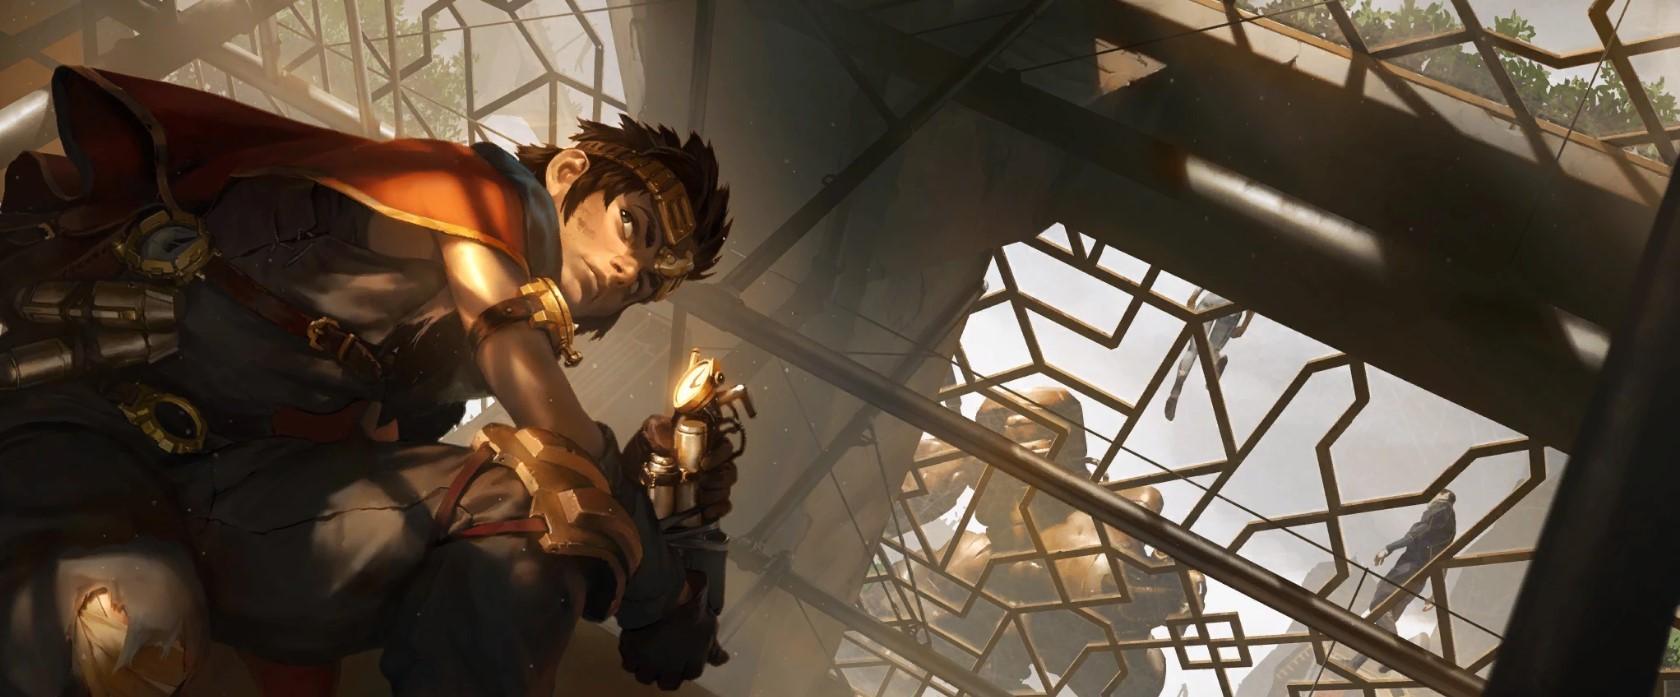 Legends of Runeterra Budget Decks (Rising Tides Expansion)